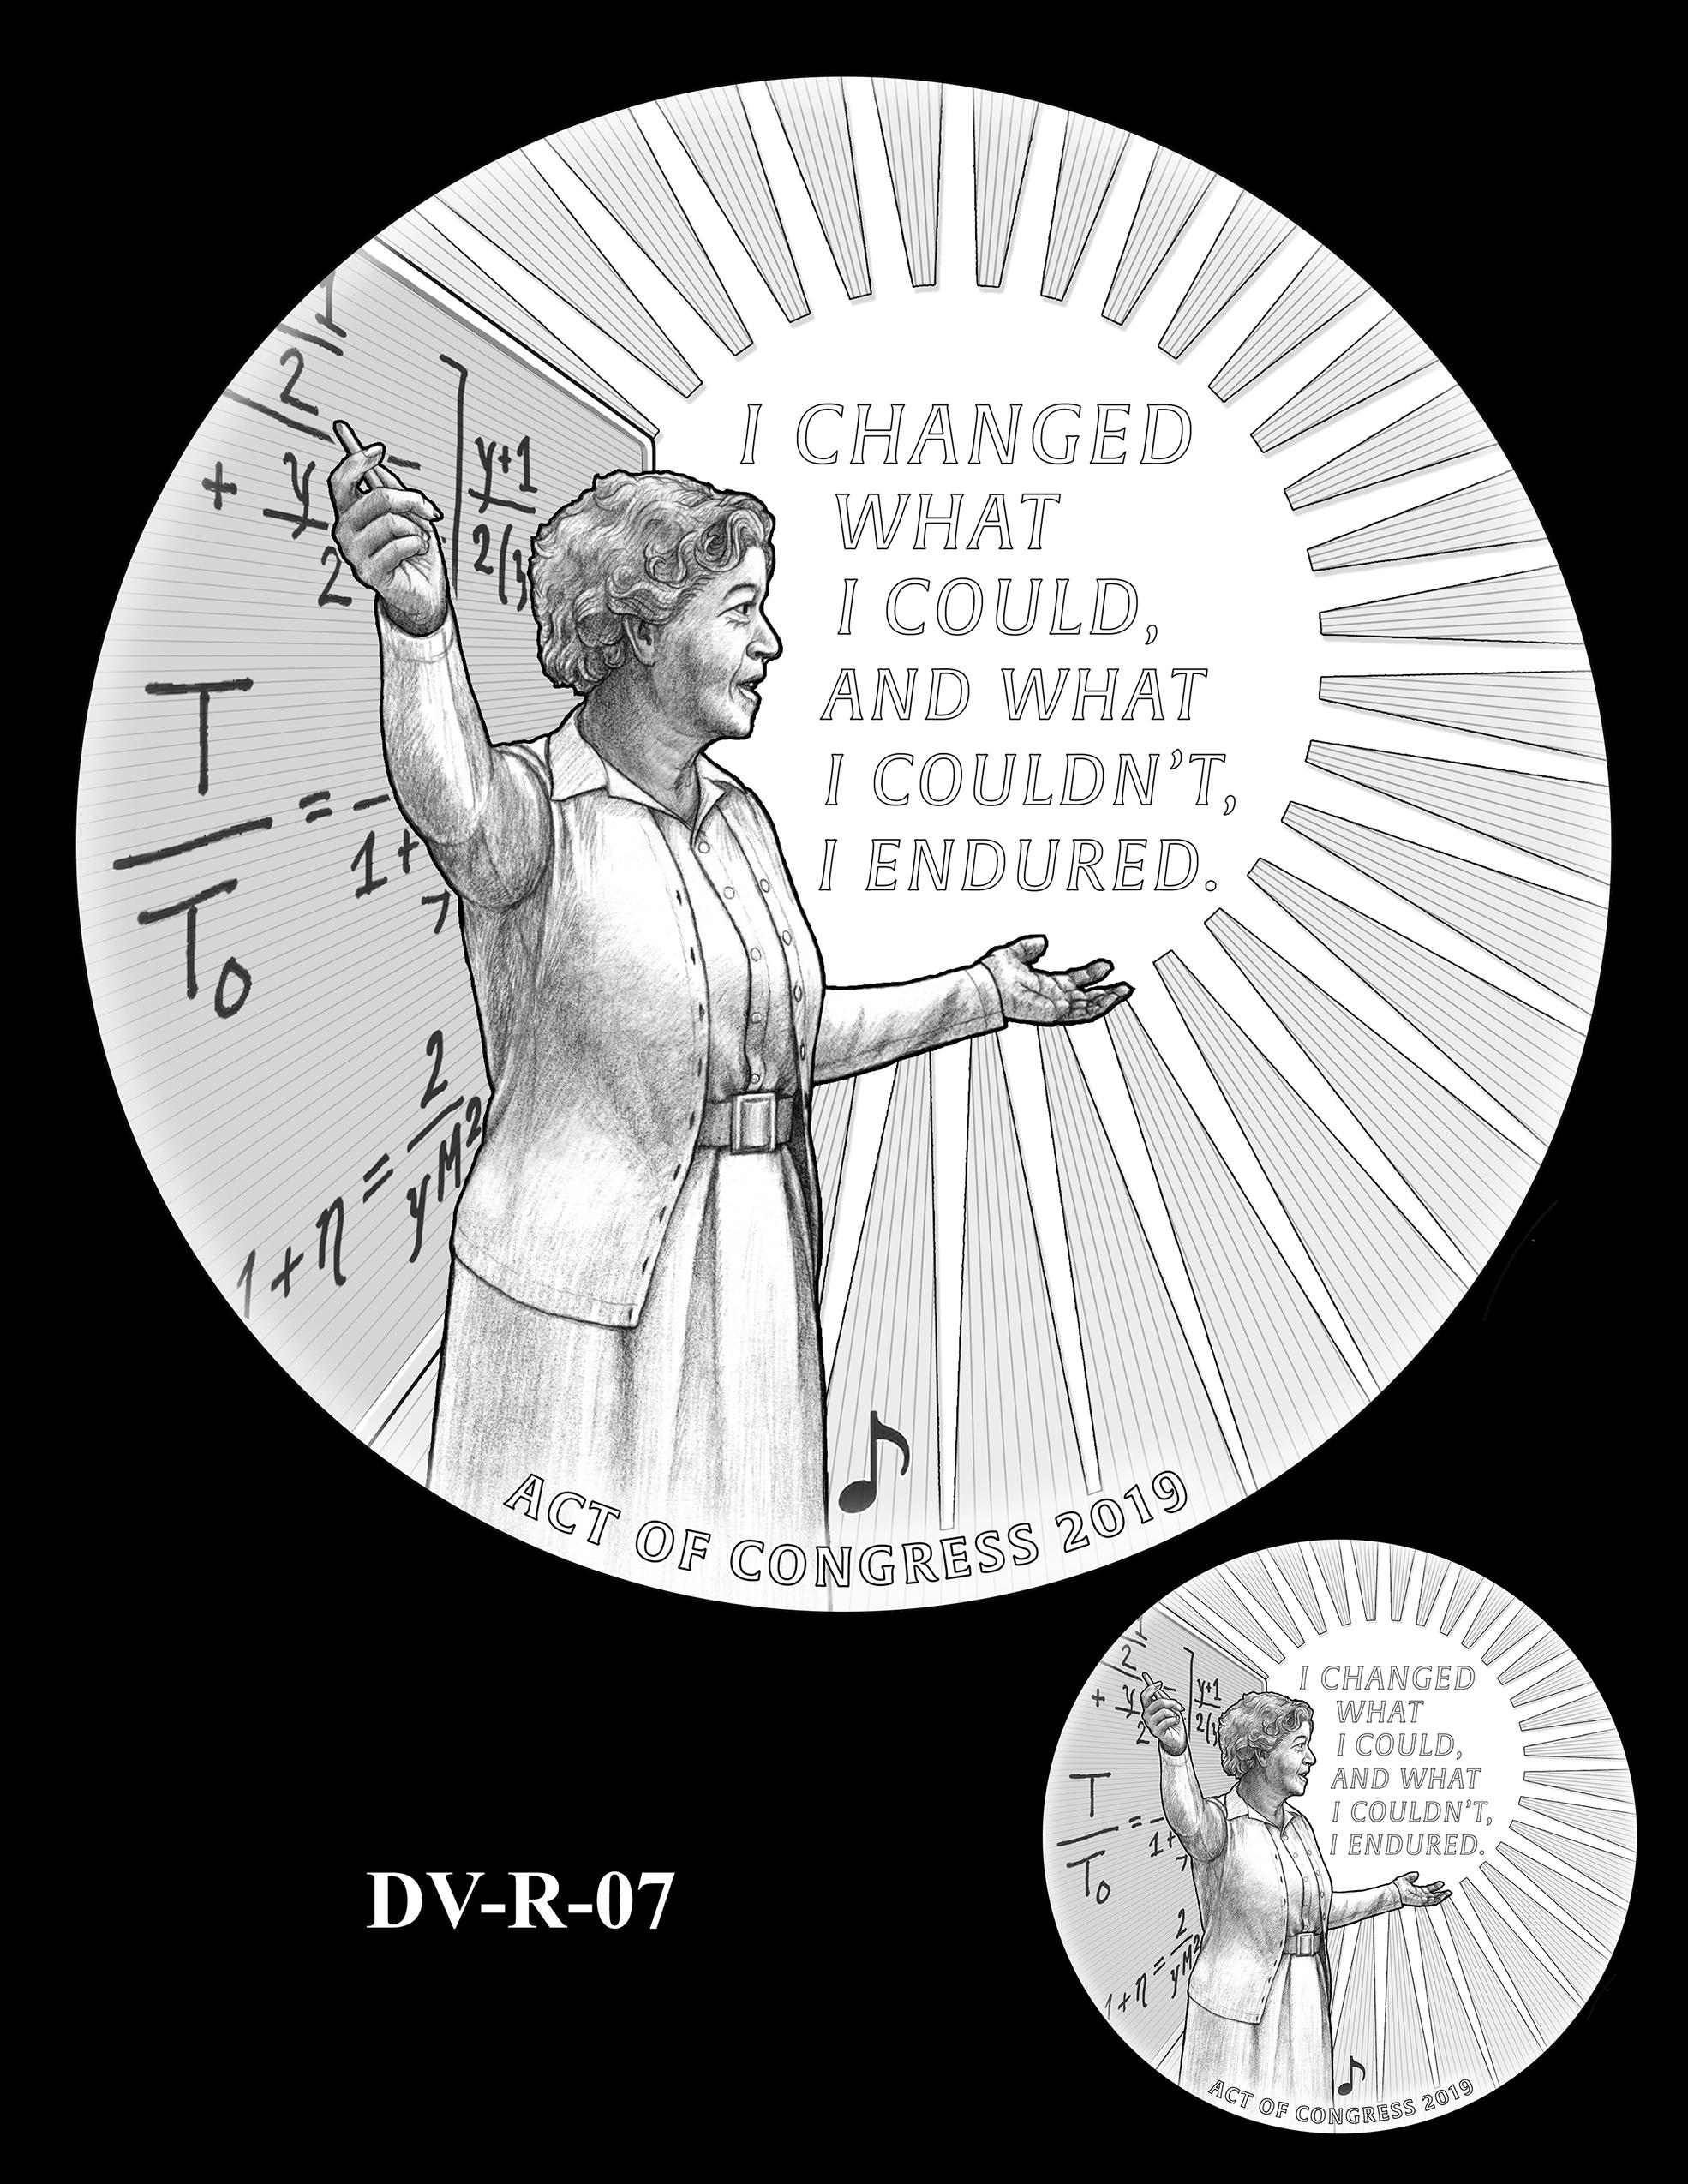 DV-R-07 -- Dorothy J. Vaughan Congressional Gold Medal